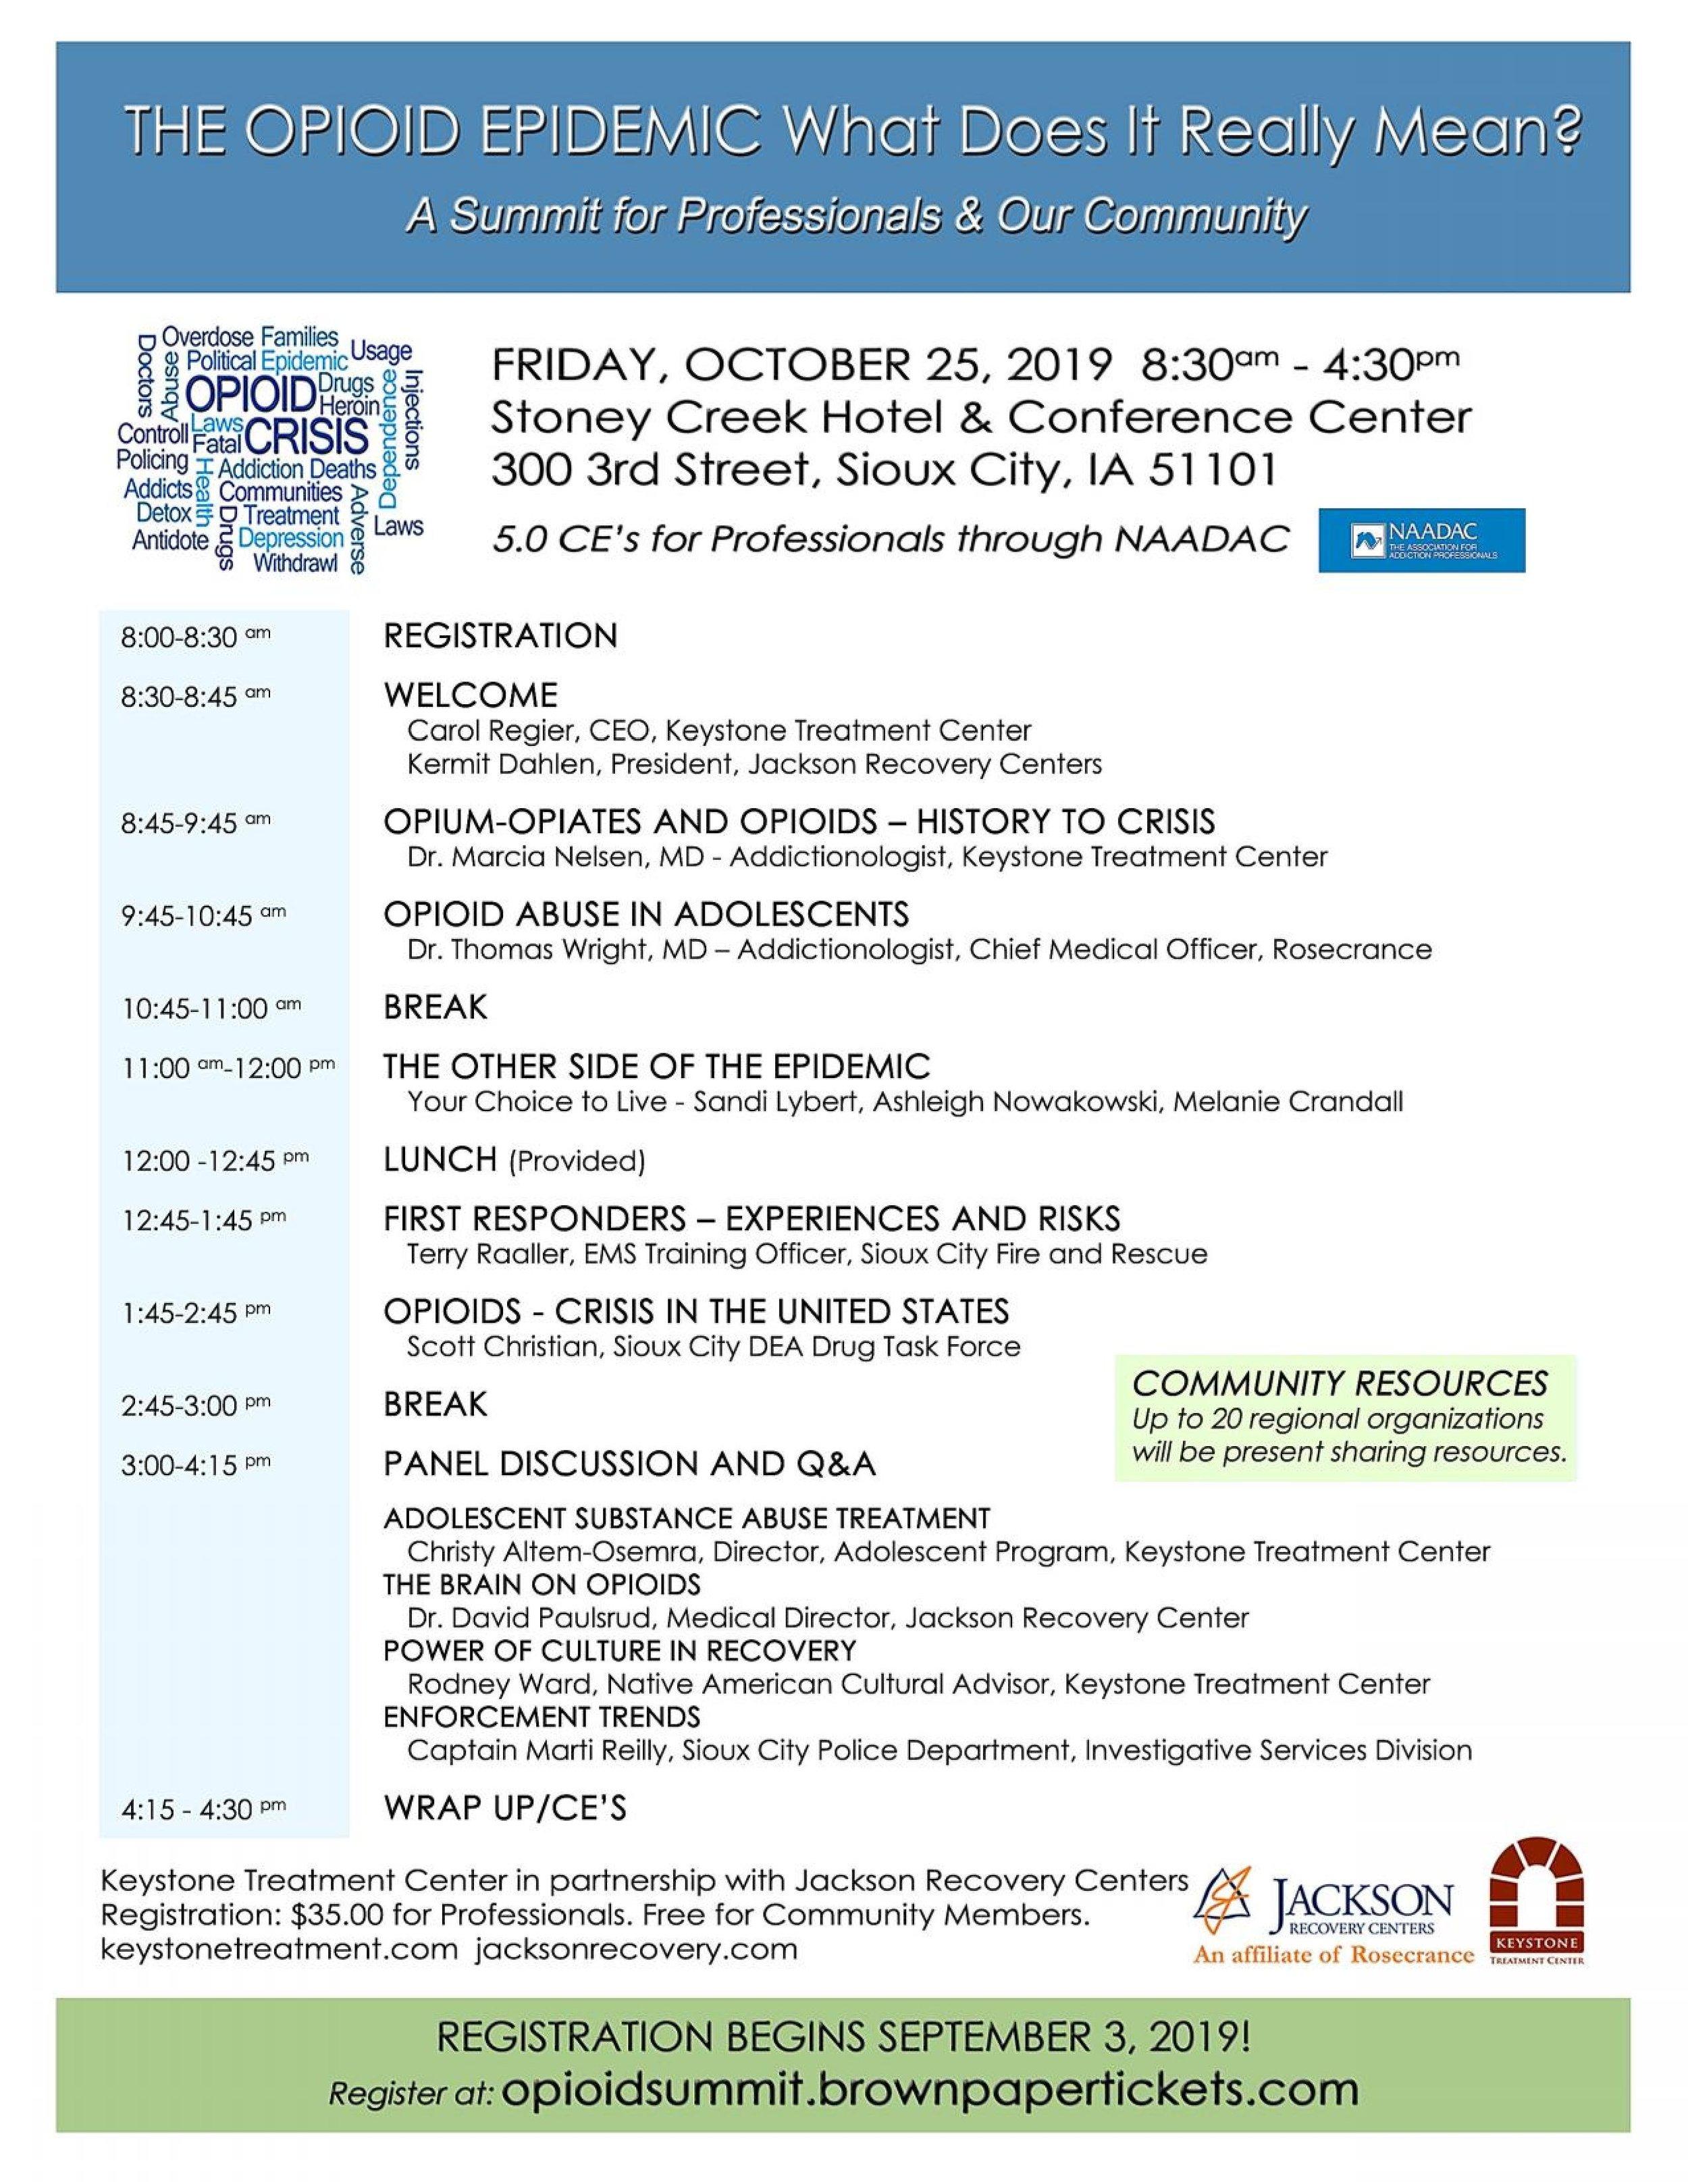 Opioid Epidemic Summit Oct 25th Full Agenda Flyer - (1)-page-001.jpg